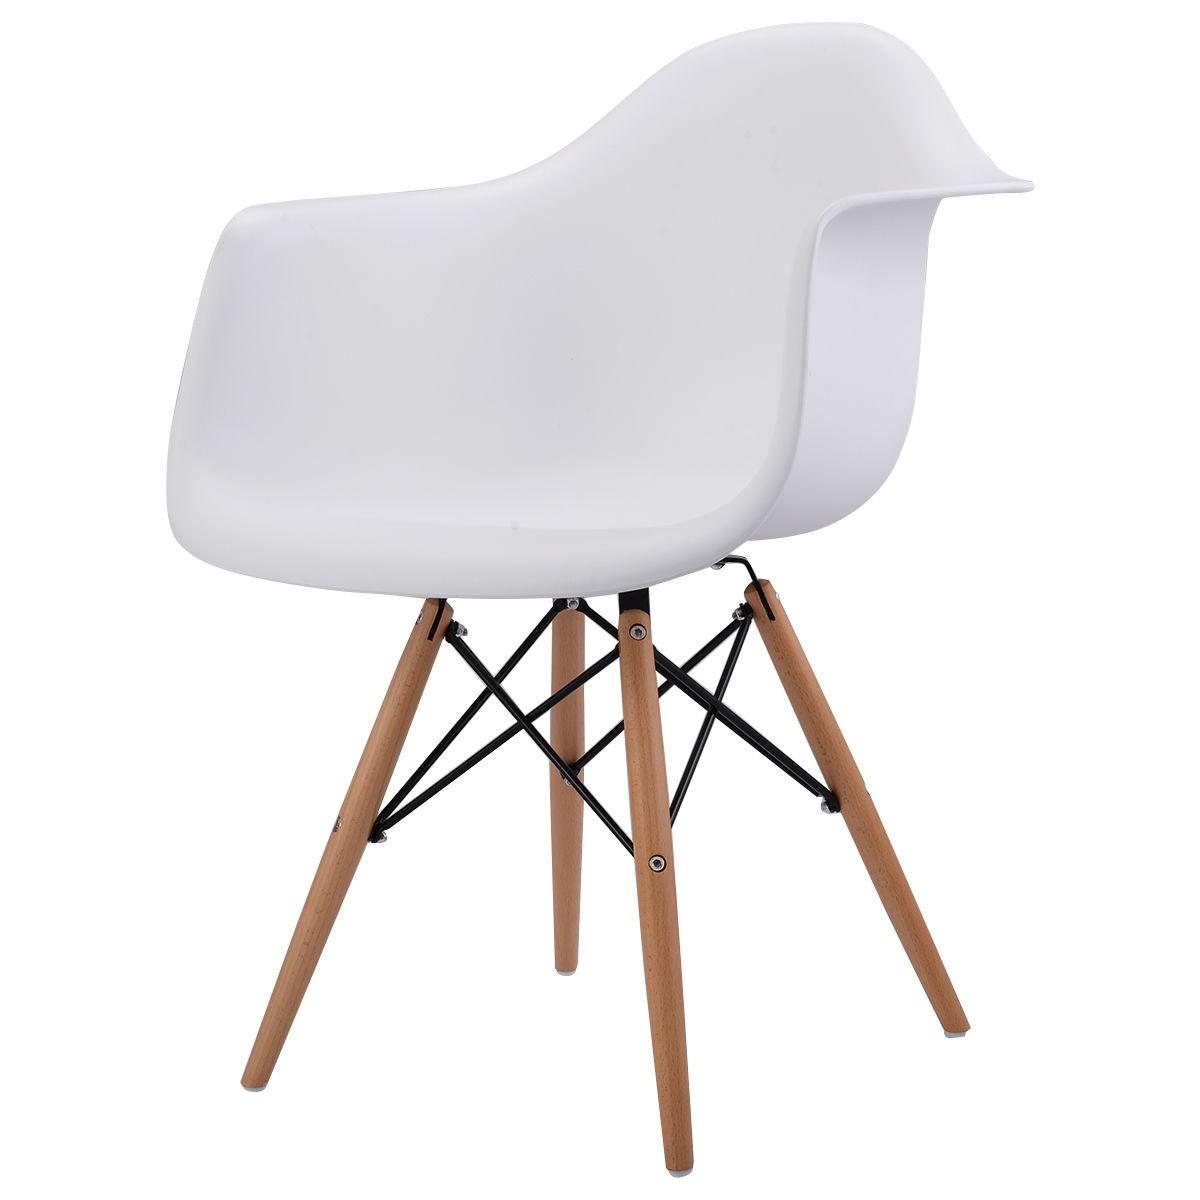 New 1pc Mid Century Modern Molded Plastic Stylish Dining Arm Chair Wood Legs